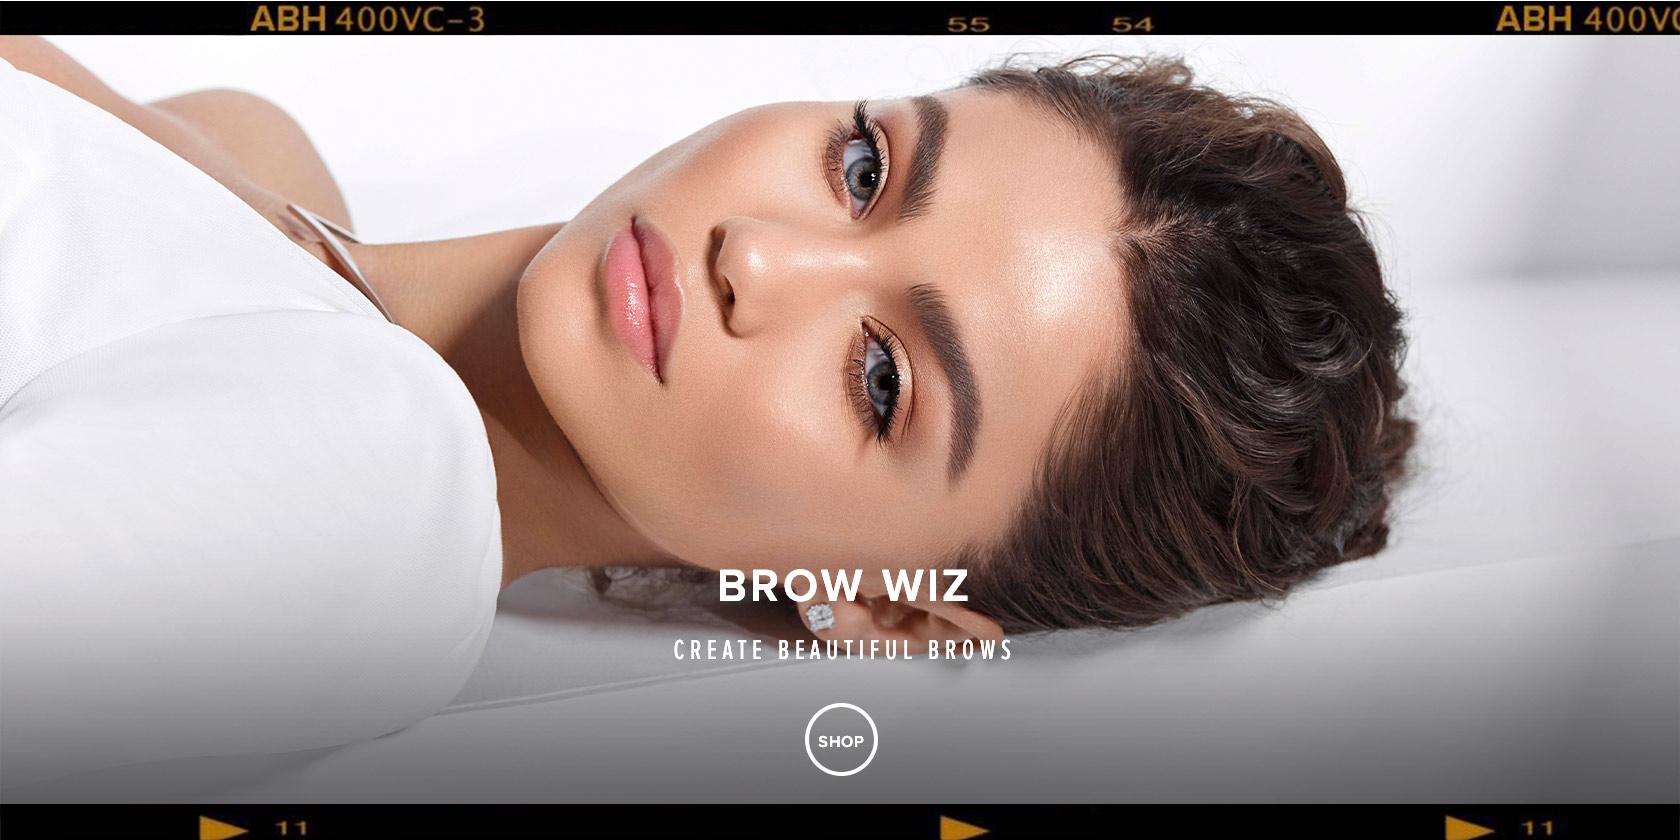 Brow Wiz - Create Beautiful Brow